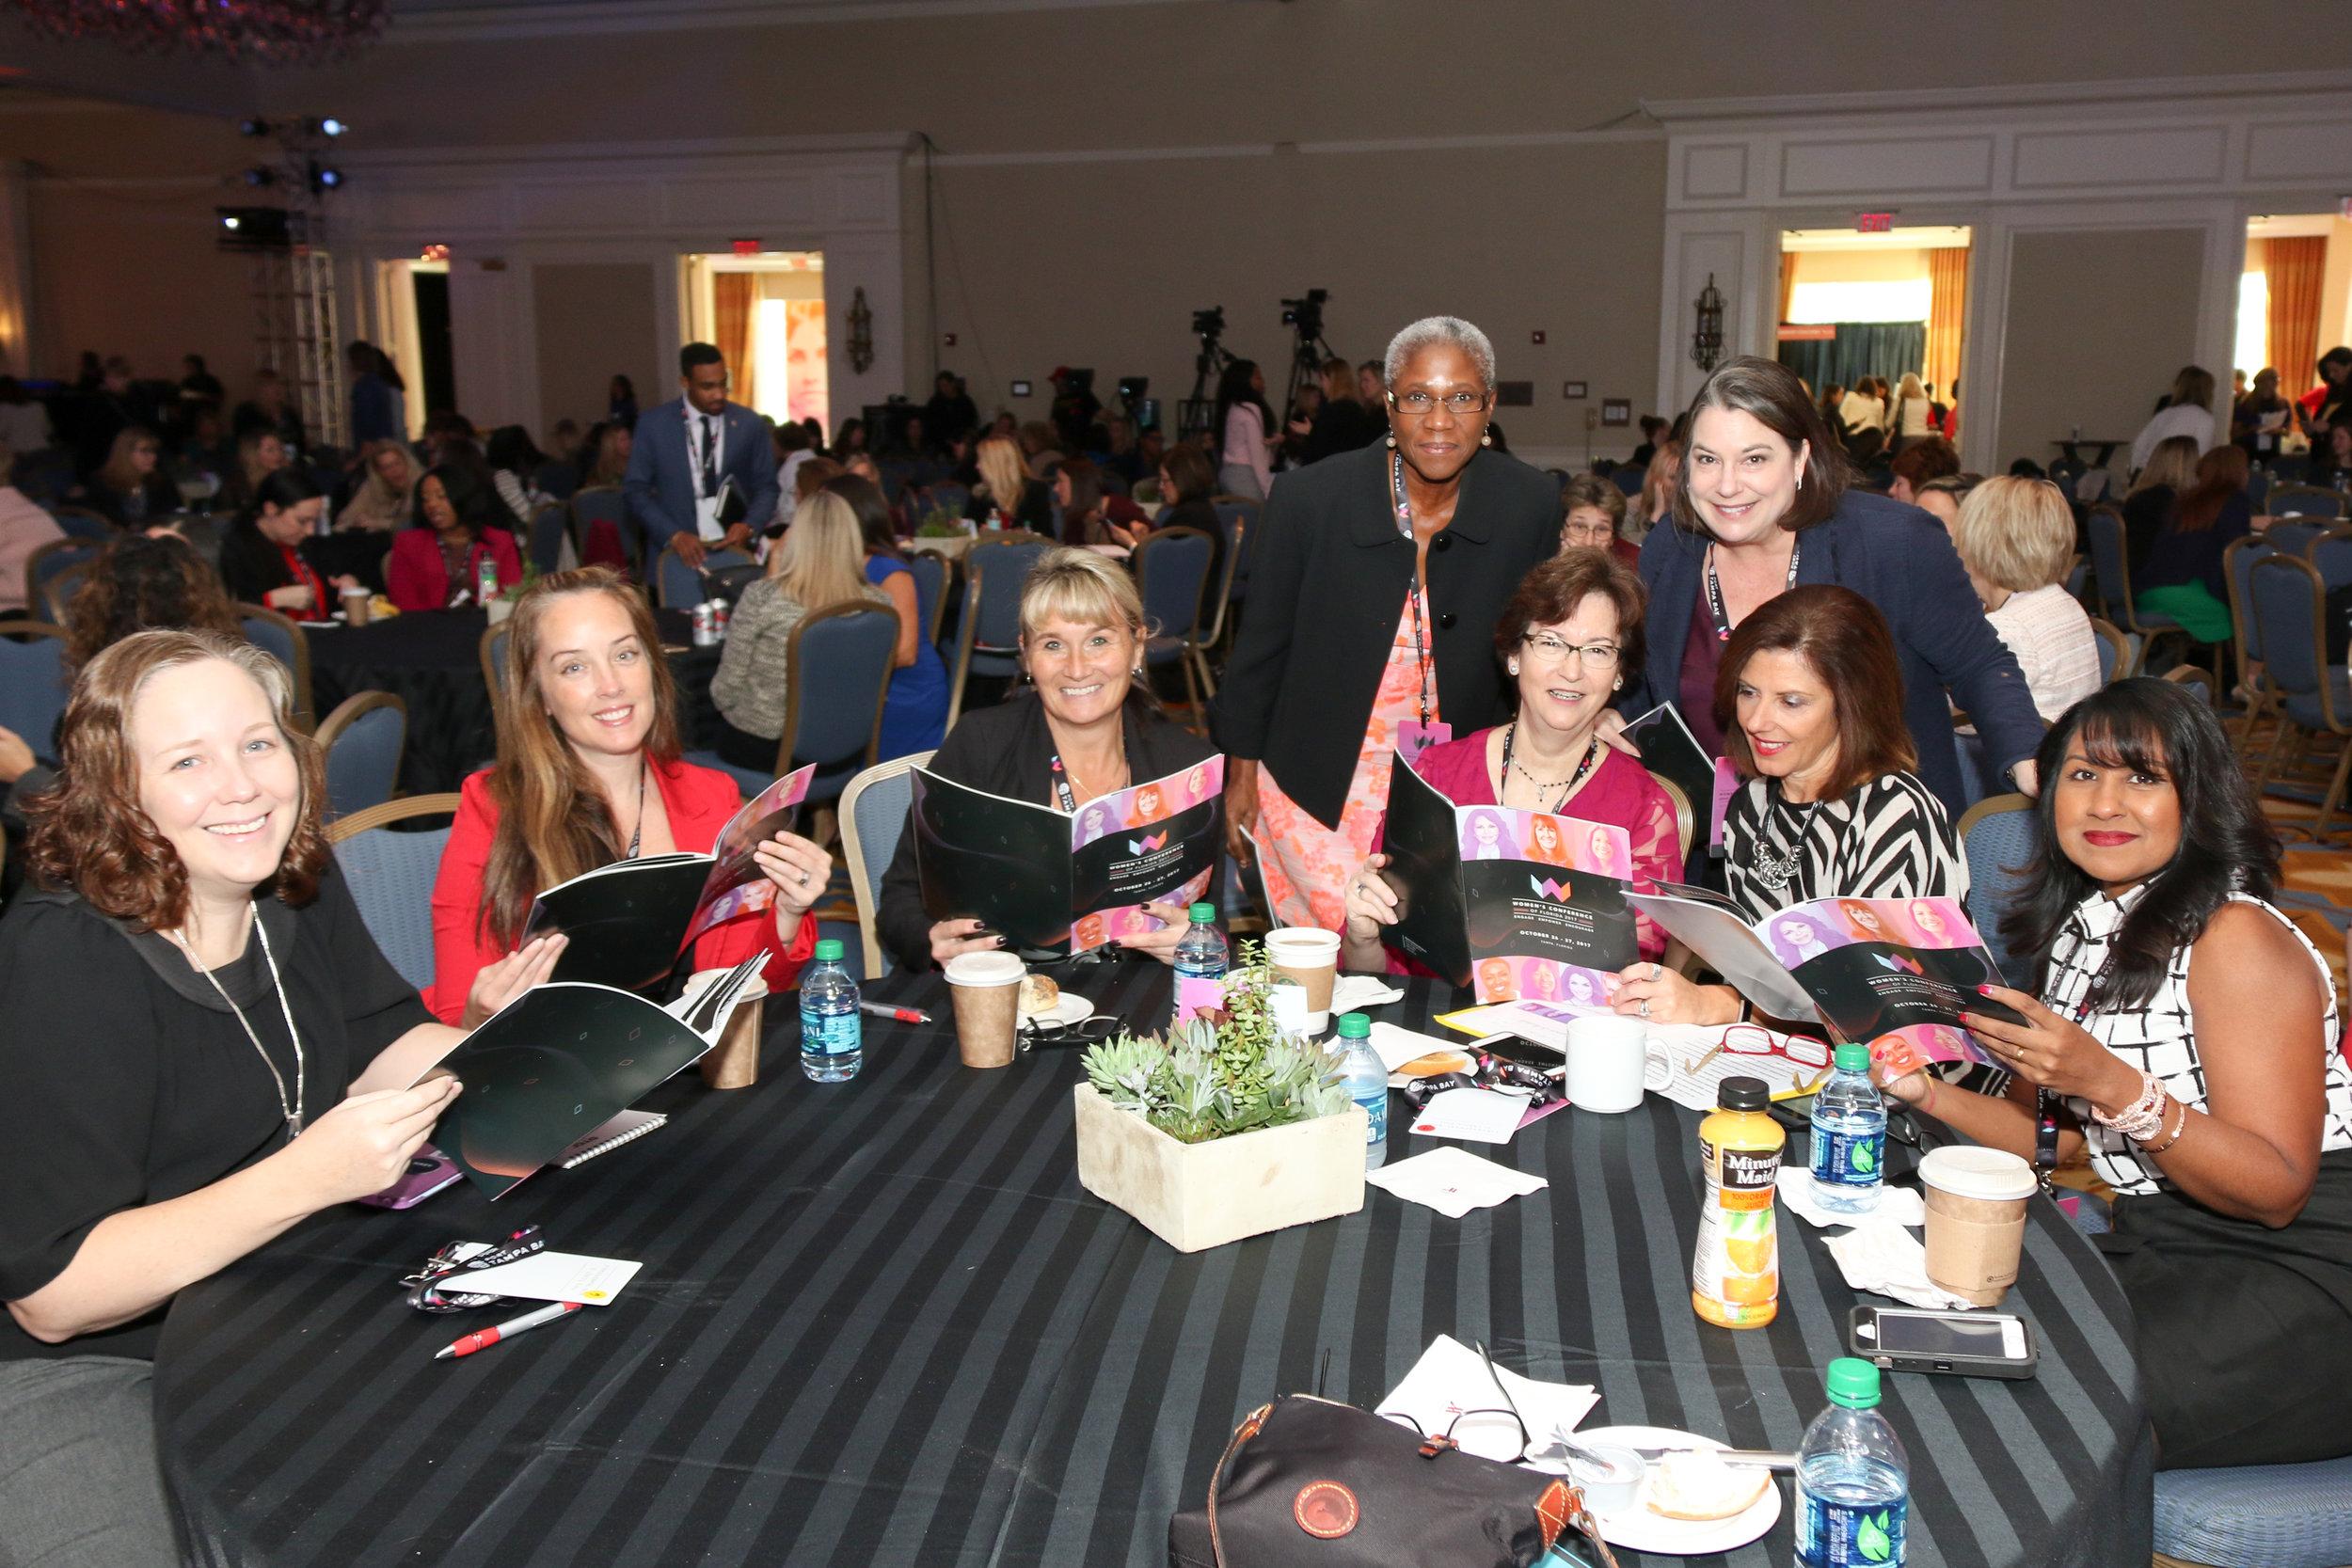 073_WomensConference_10-26-17.jpg